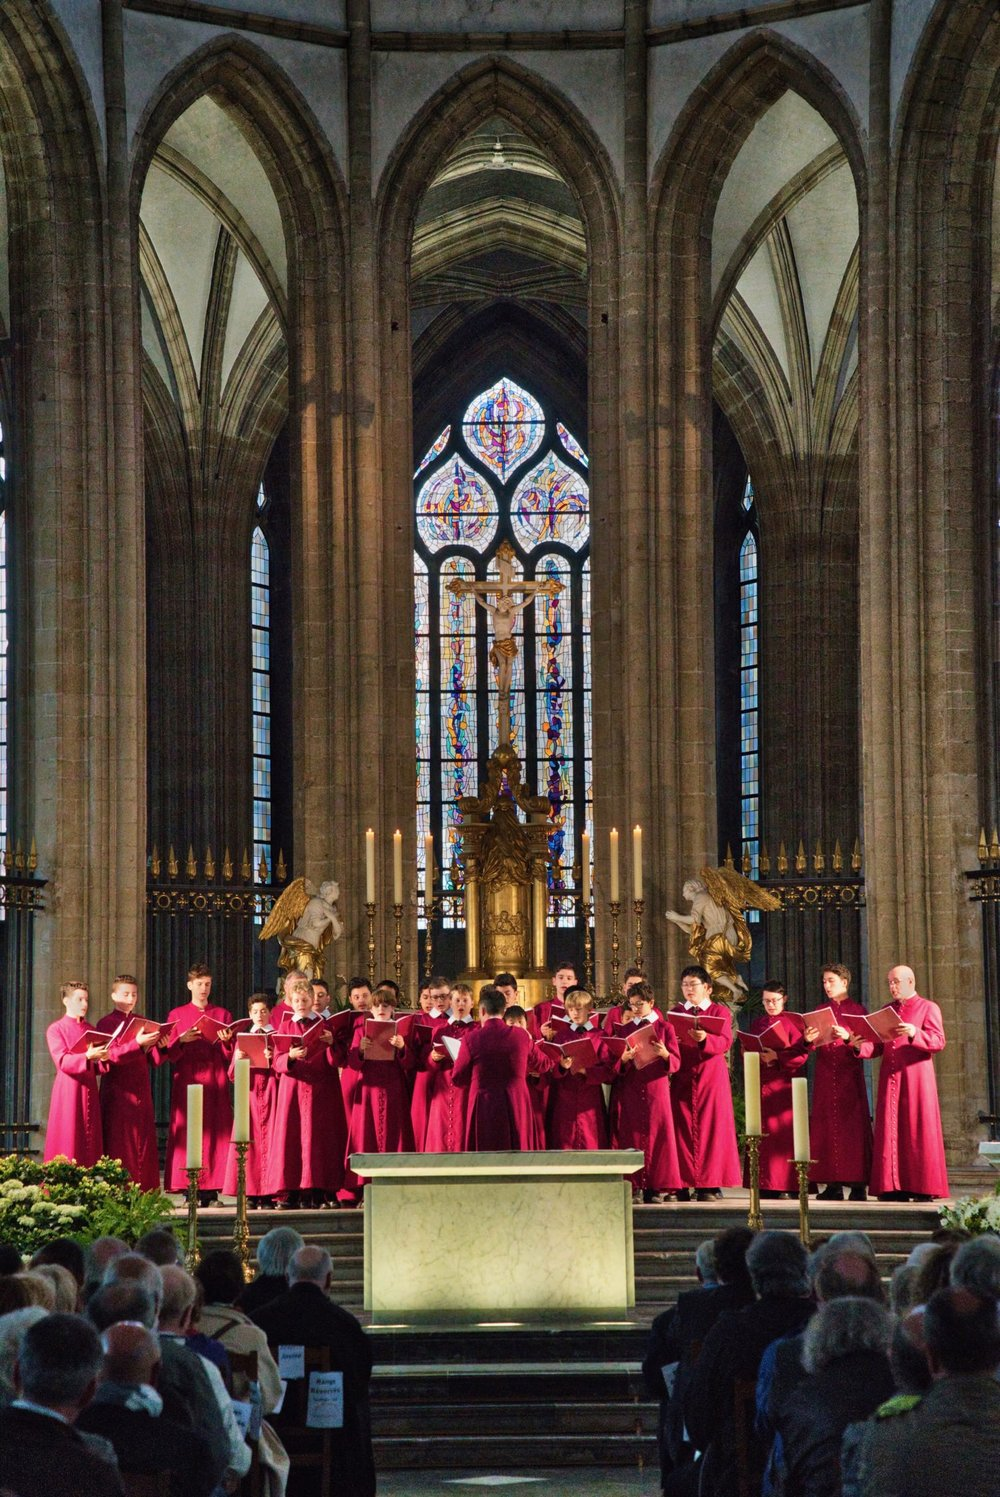 The Choir performs at the église Saint-Eloi in Dunkirk.